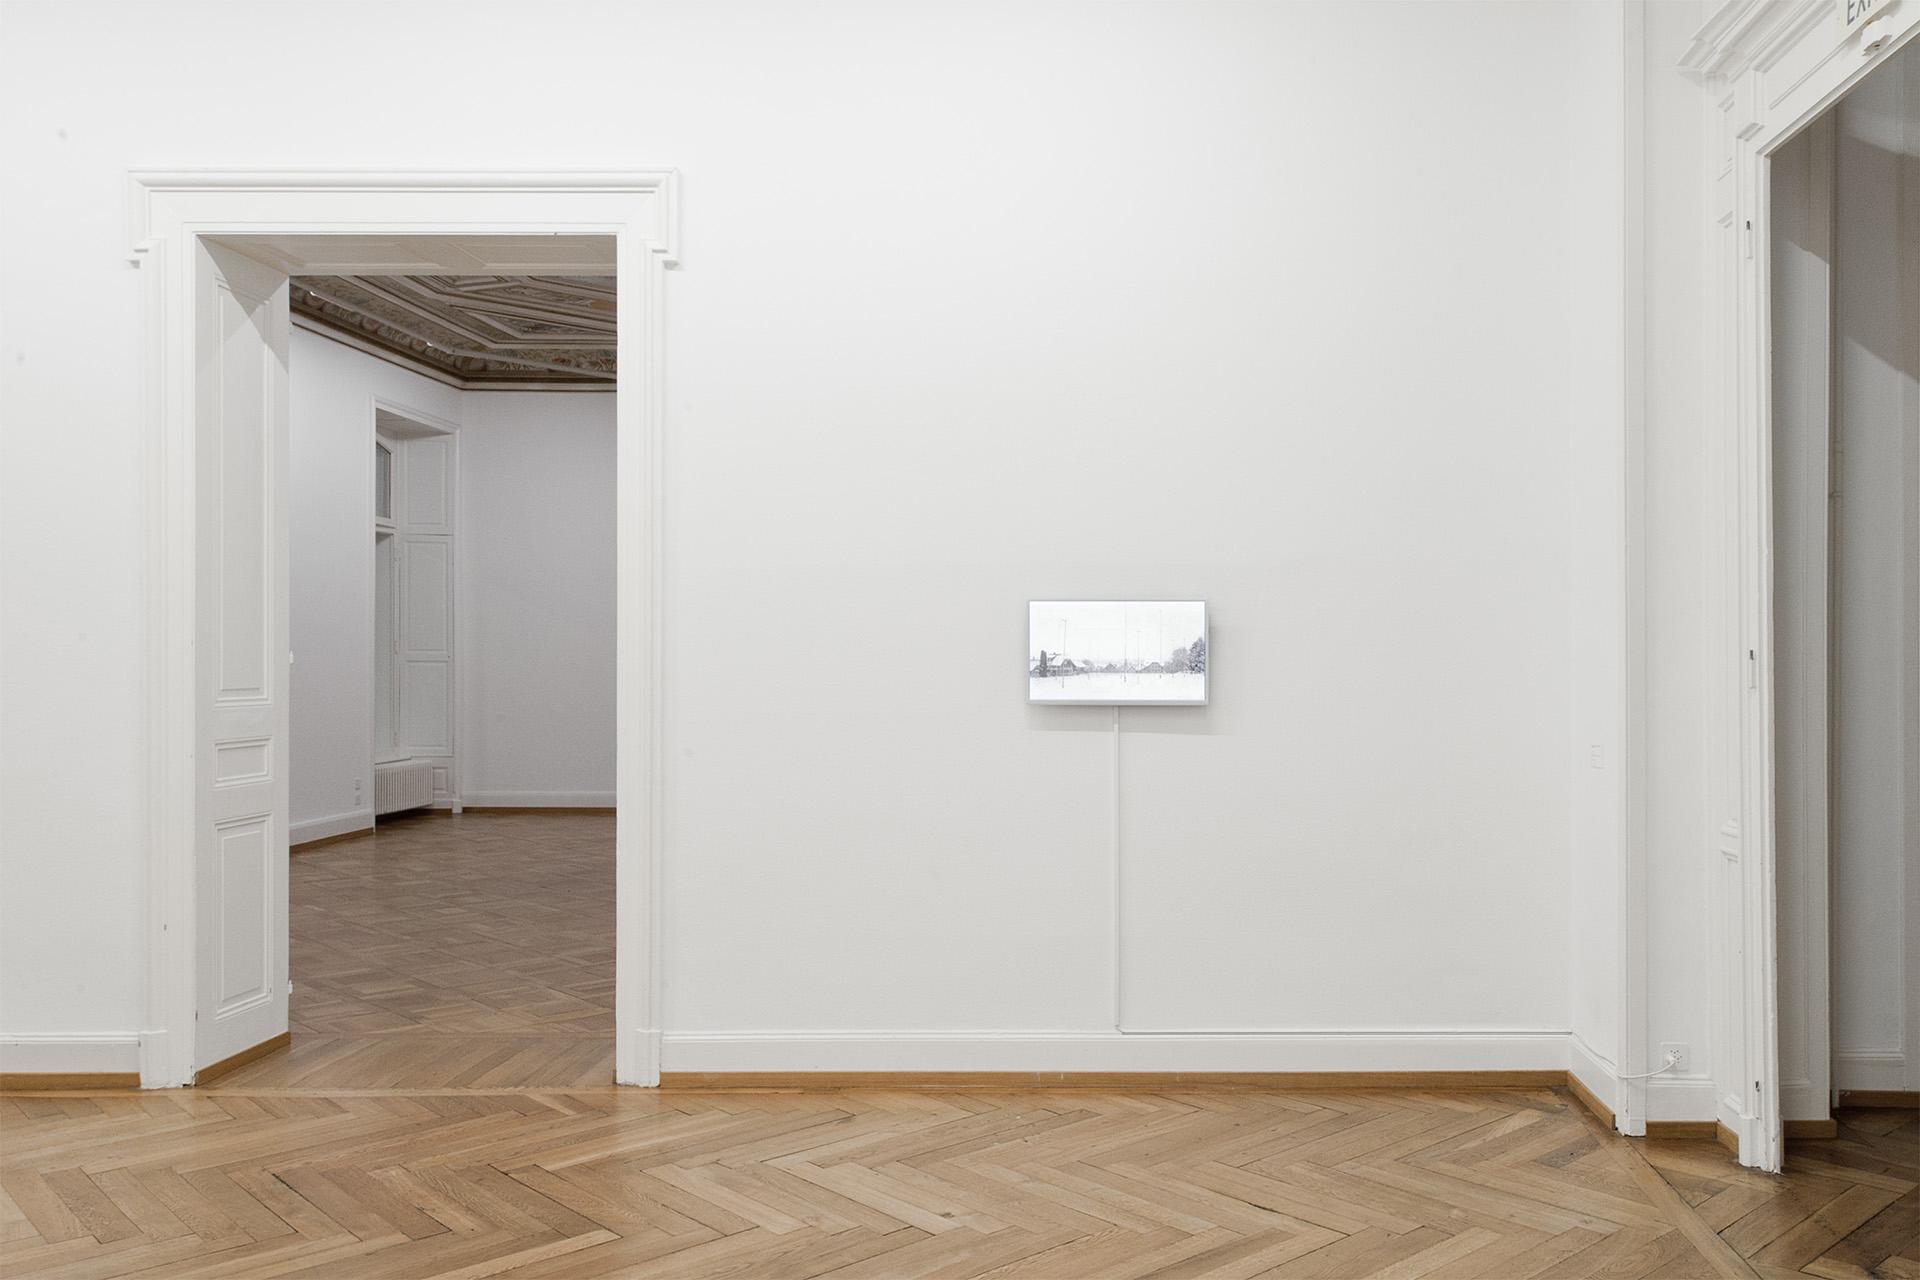 Video Bauland | Kunstmuseum Thun | Äschlimann Corti Stipendium | 2015